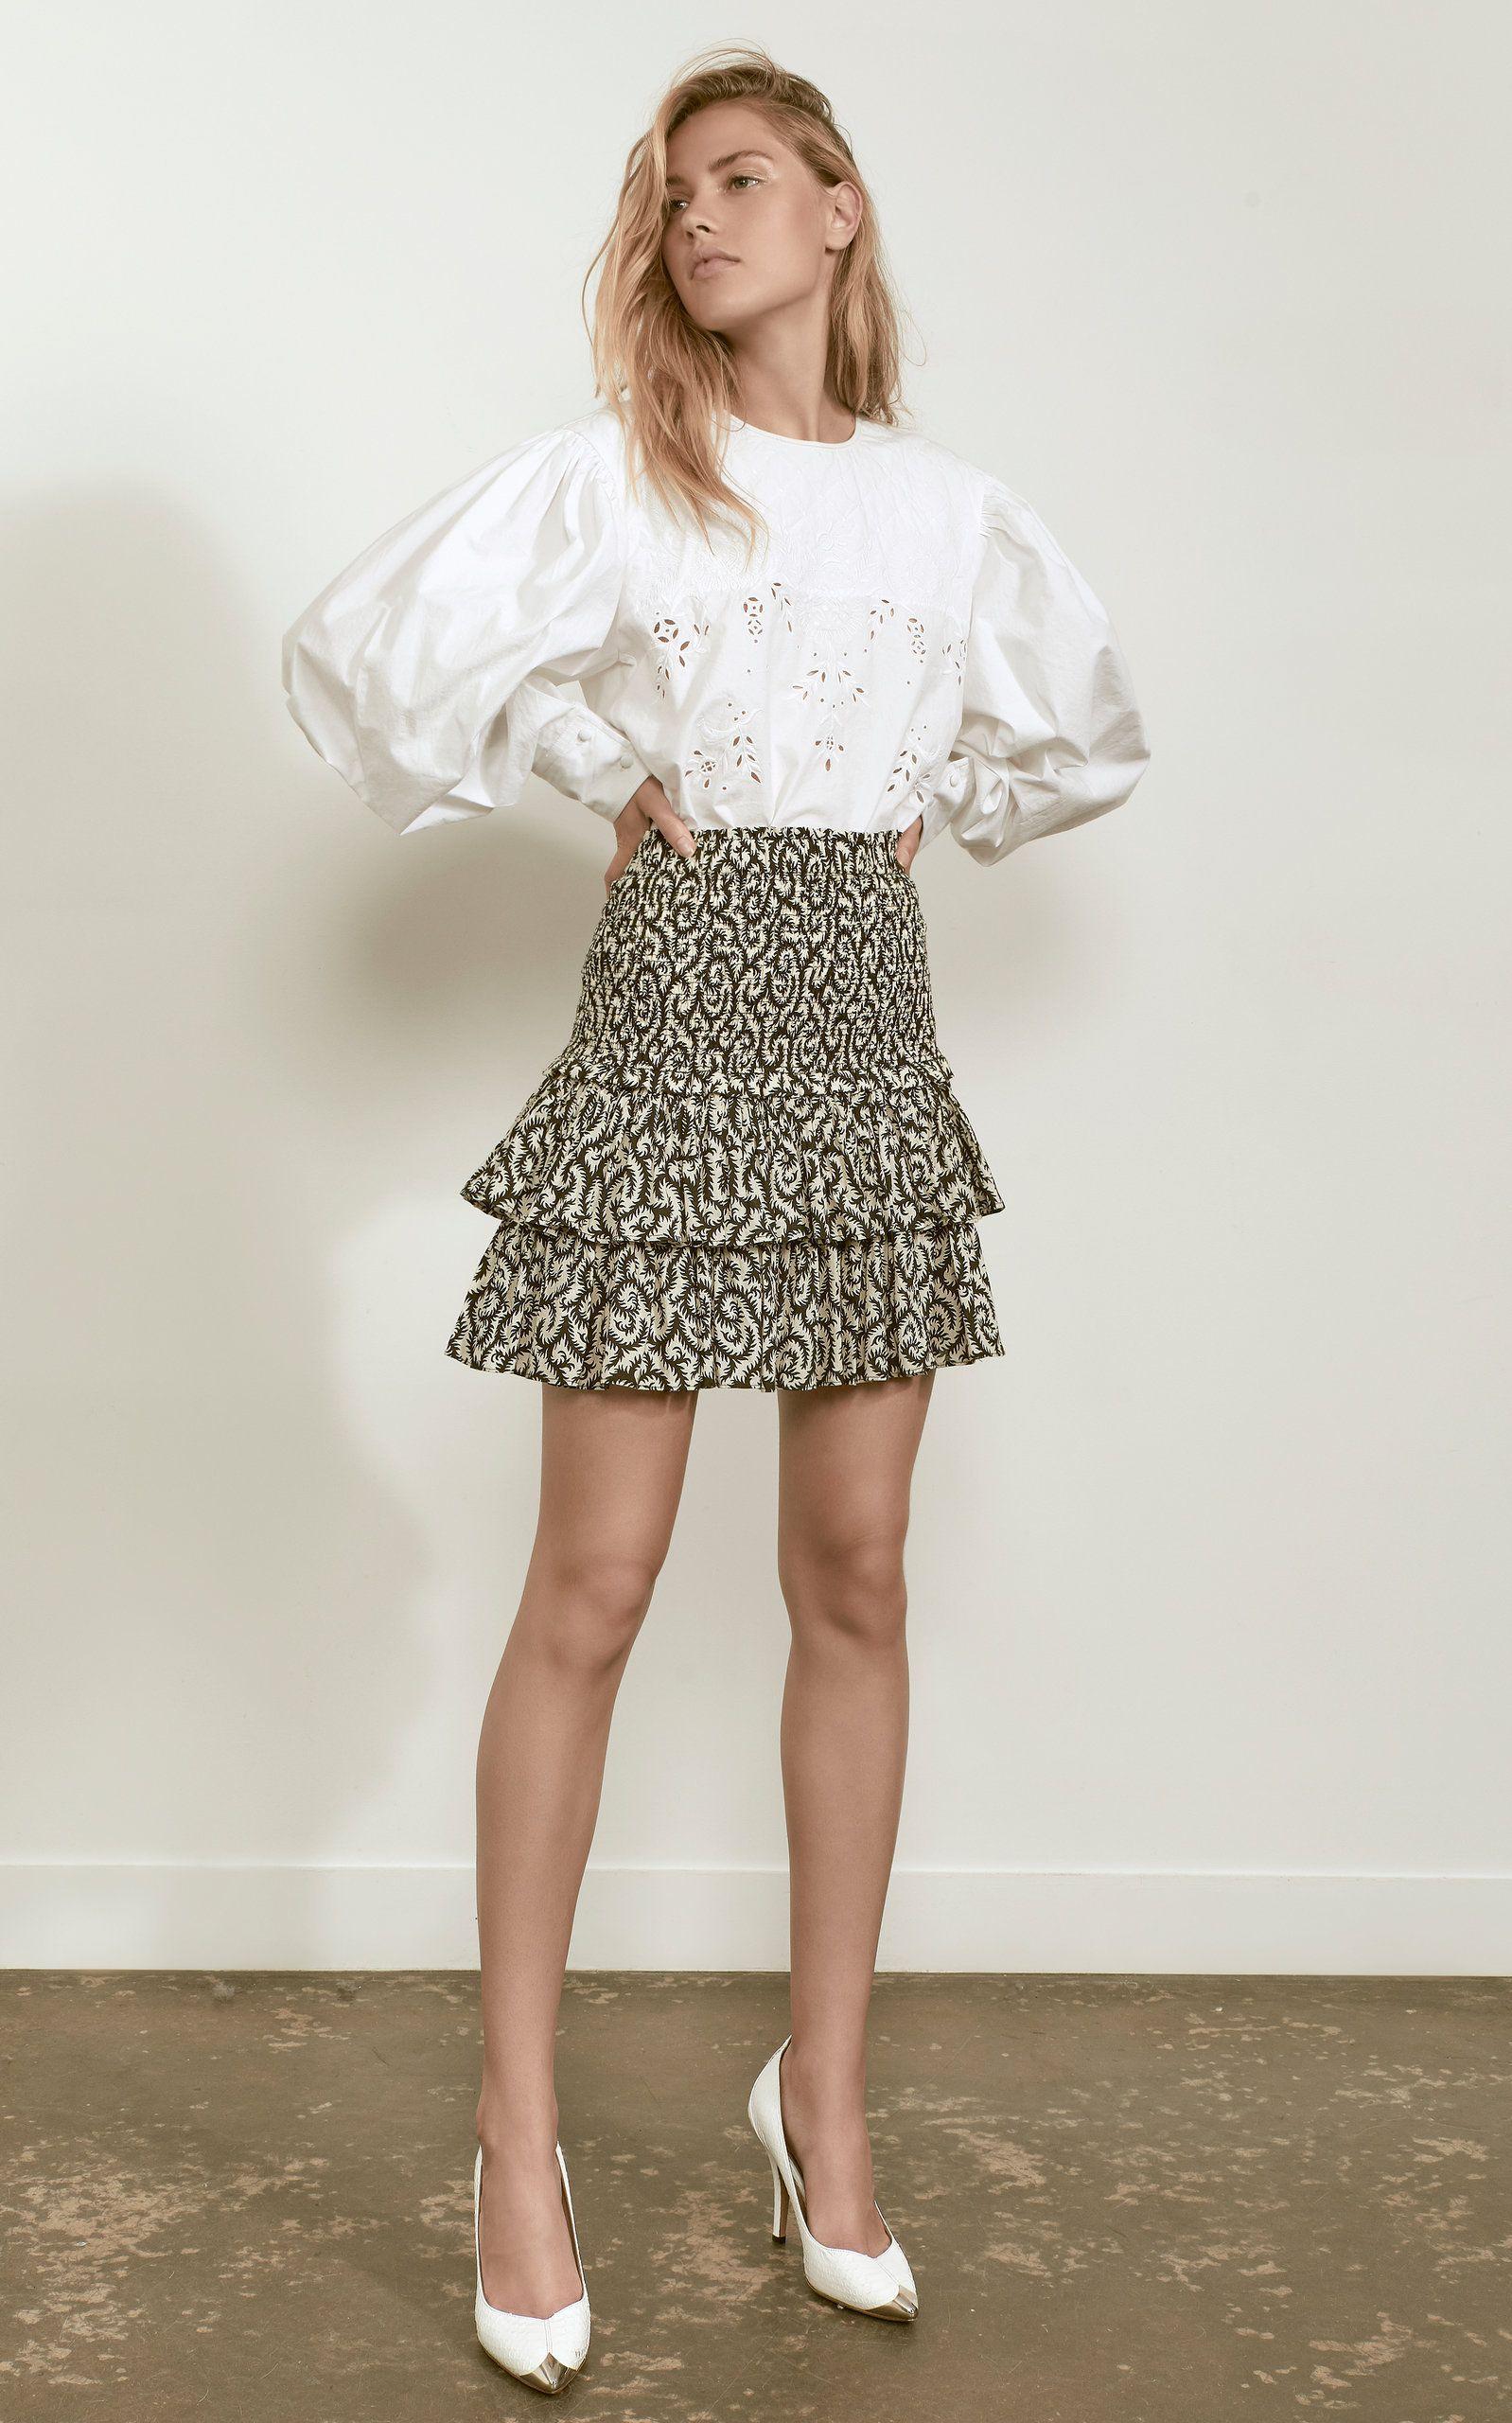 09cc6b9cc4 Wona Embroidered Cotton-Poplin Top by ISABEL MARANT ÉTOILE Now Available on  Moda Operandi